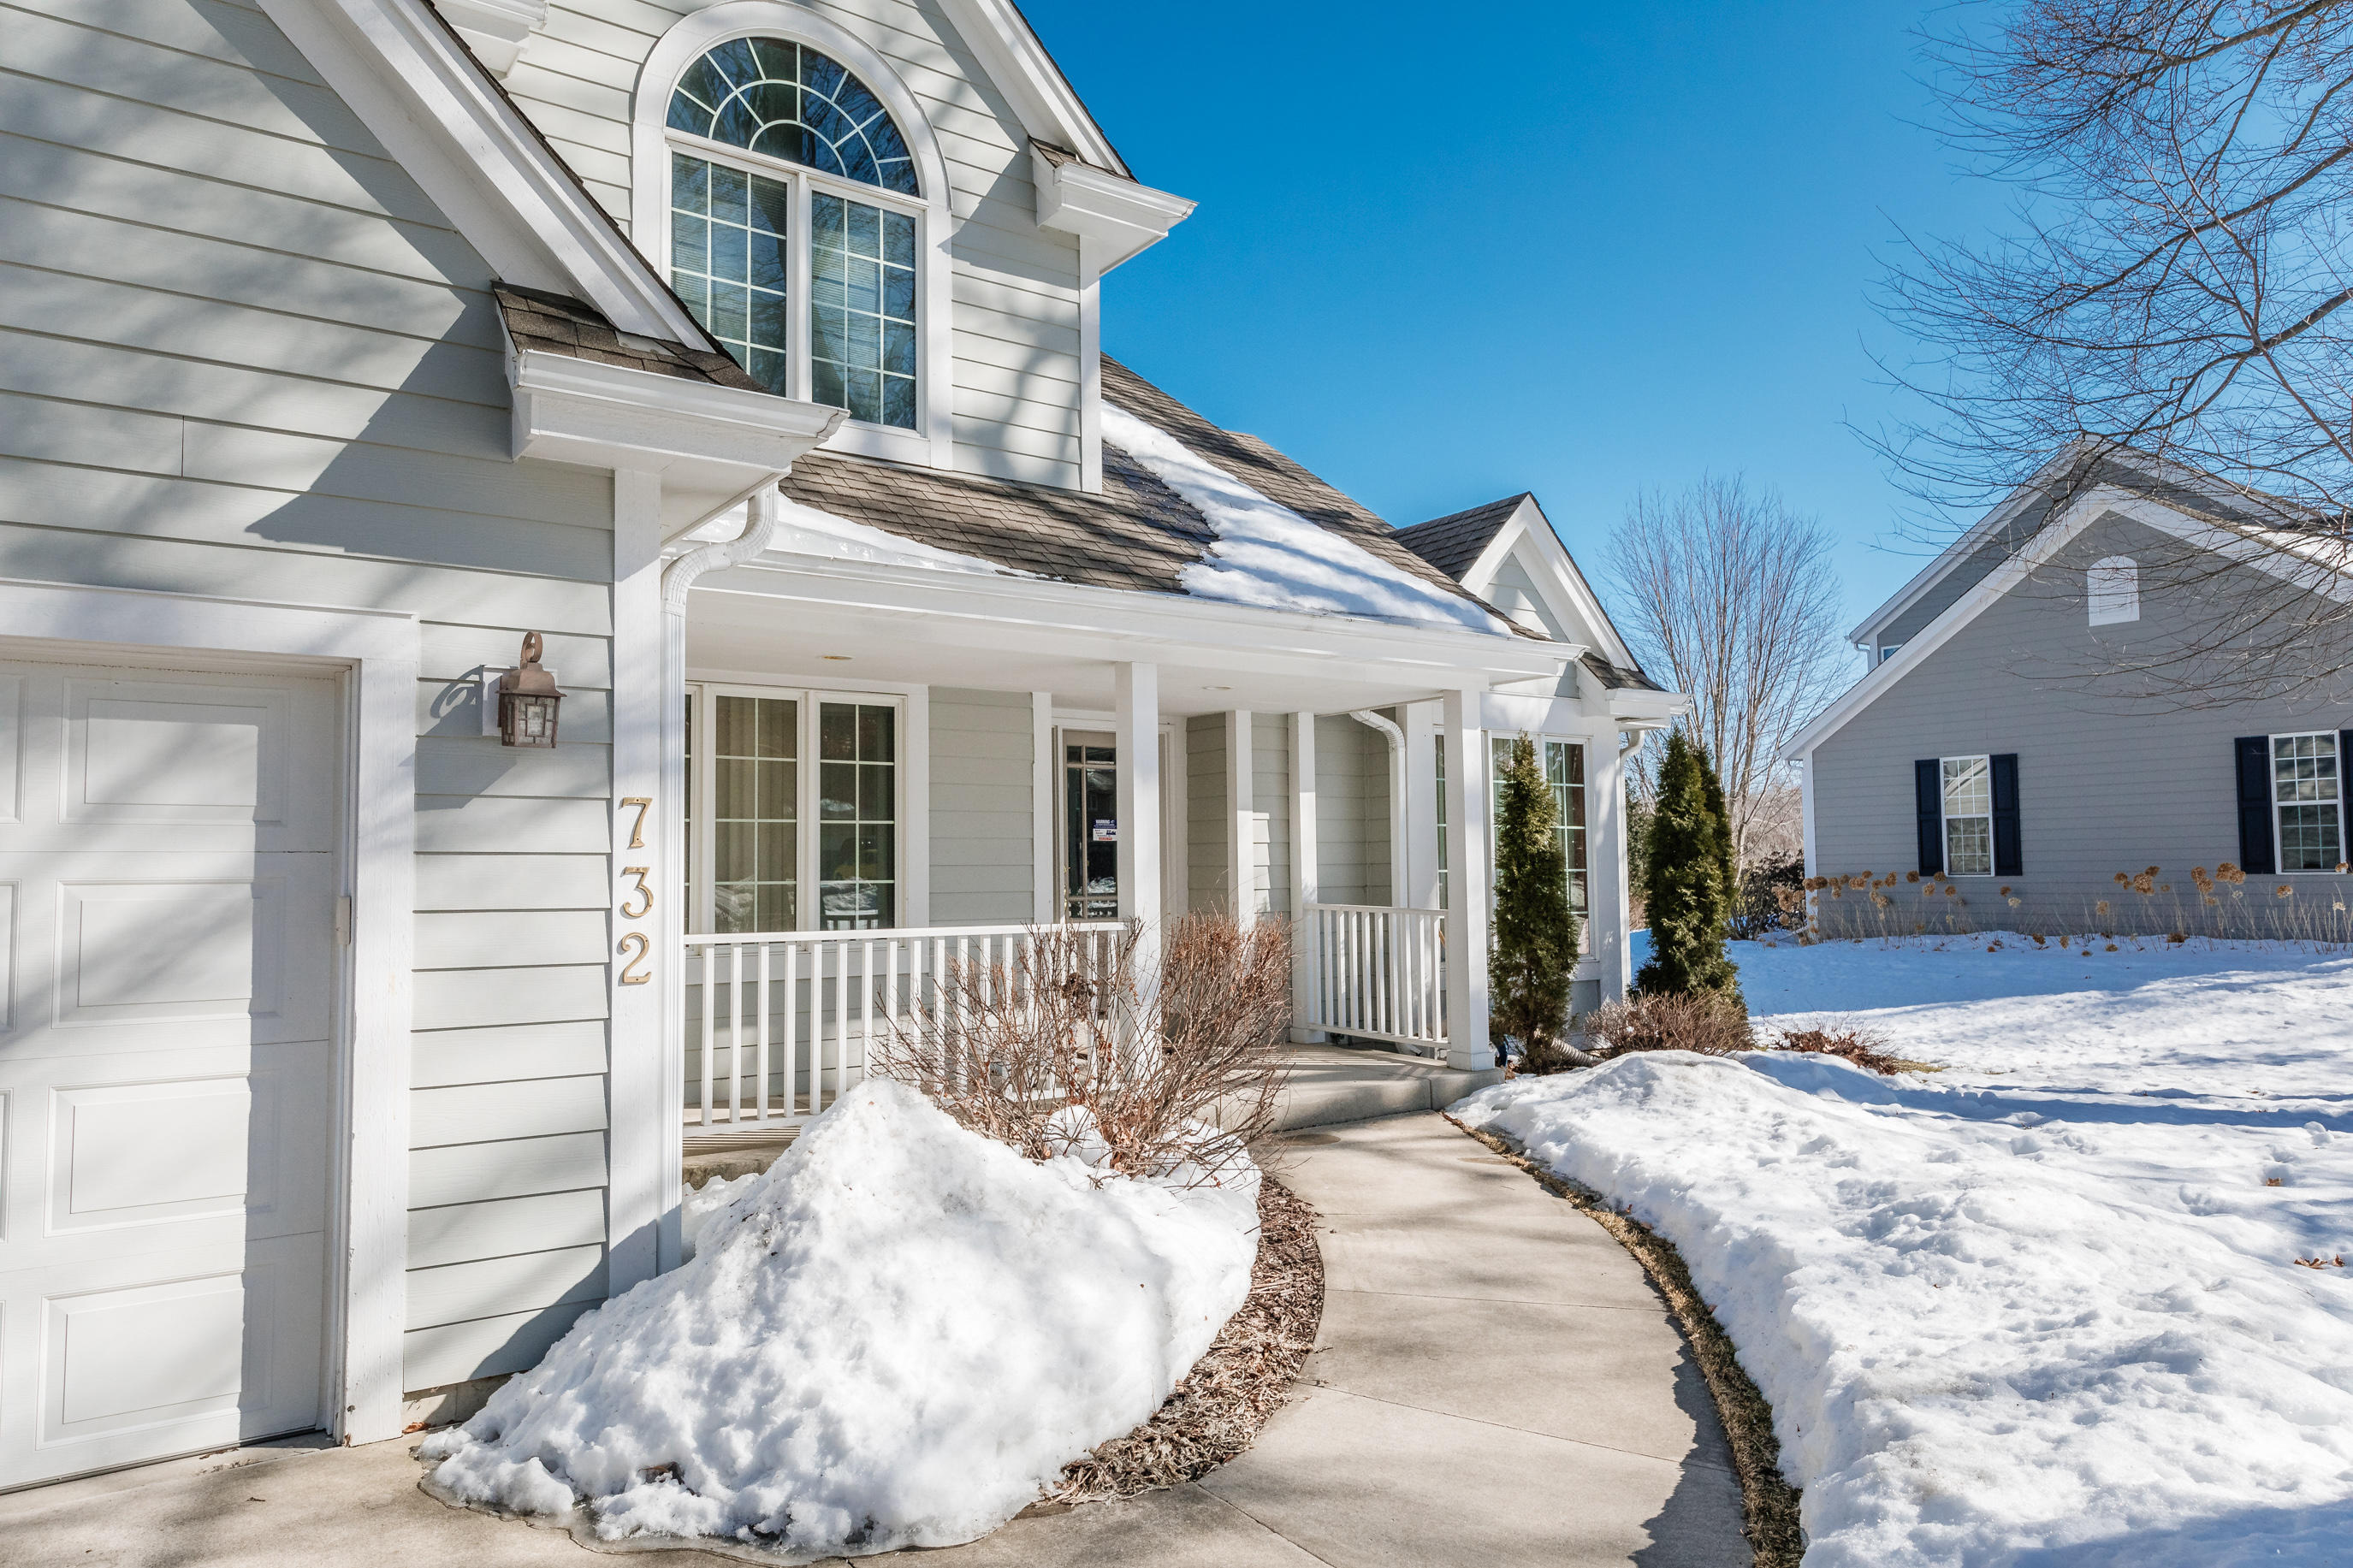 732 Winston Way, Hartland, Wisconsin 53029, 5 Bedrooms Bedrooms, 9 Rooms Rooms,2 BathroomsBathrooms,Single-Family,For Sale,Winston Way,1728971